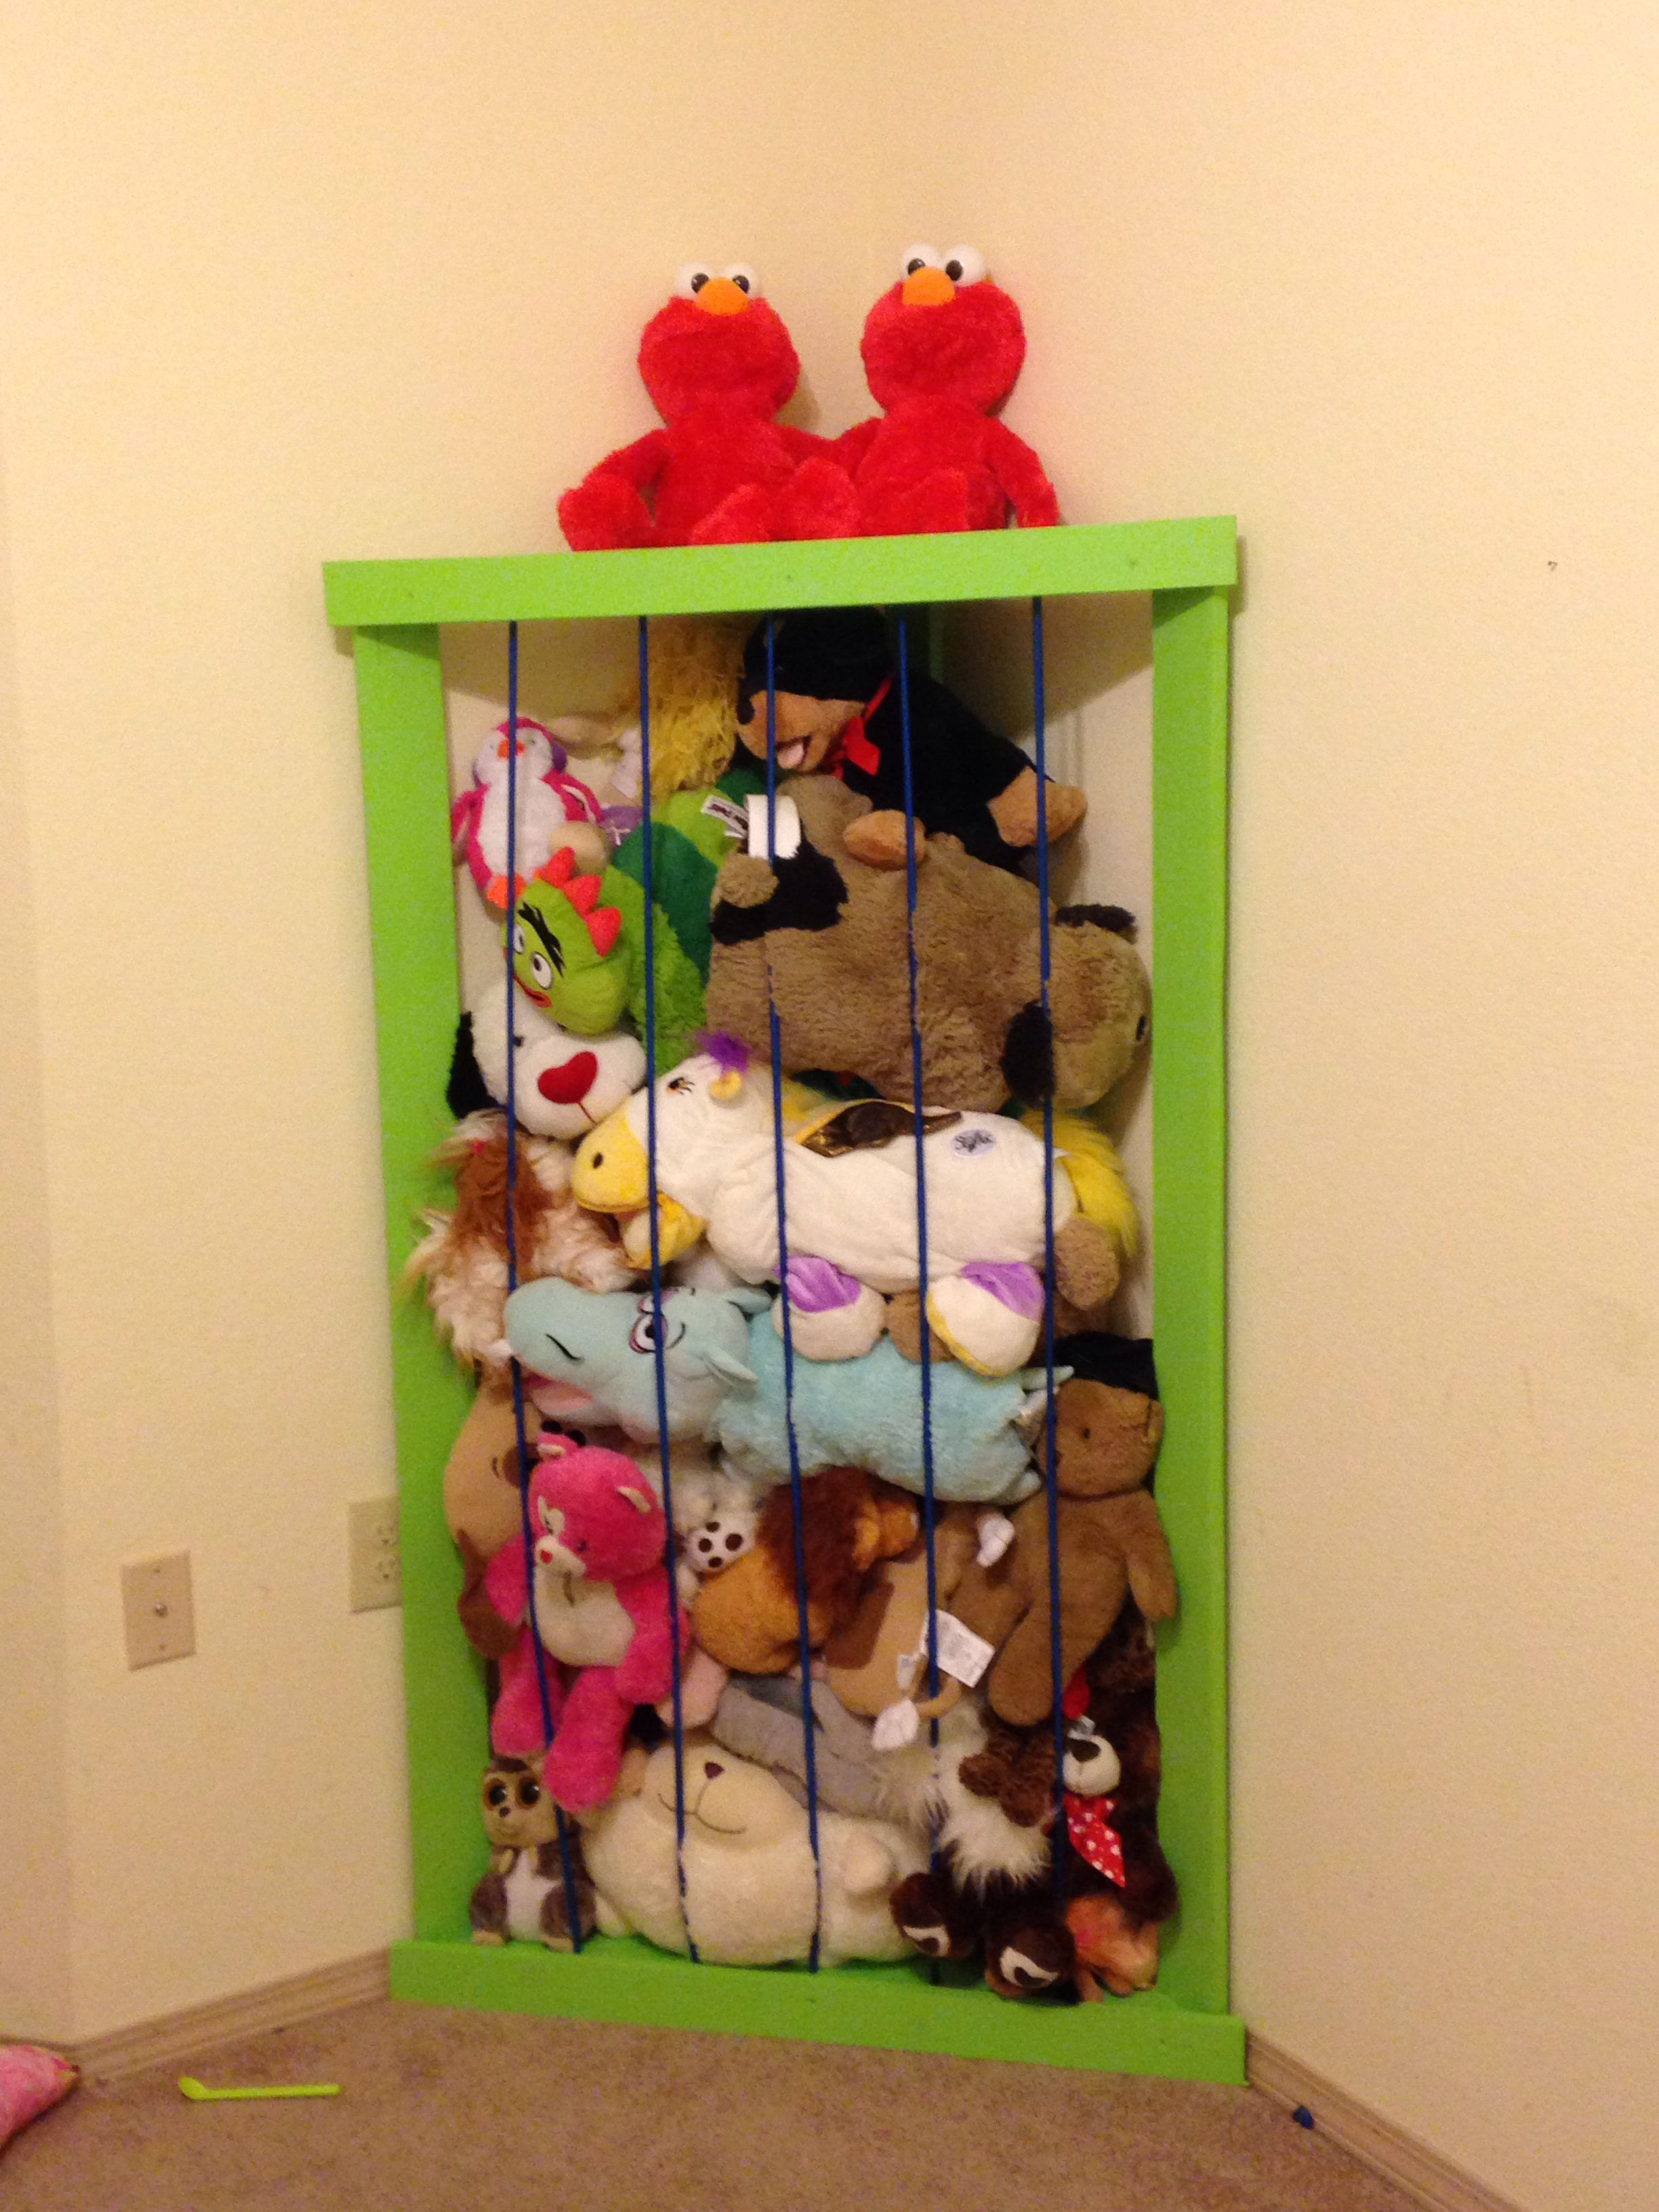 Stuffed Animal Zoo Stuffed Animal Storage Diy Stuffed Animals Stuffed Animal Storage Diy